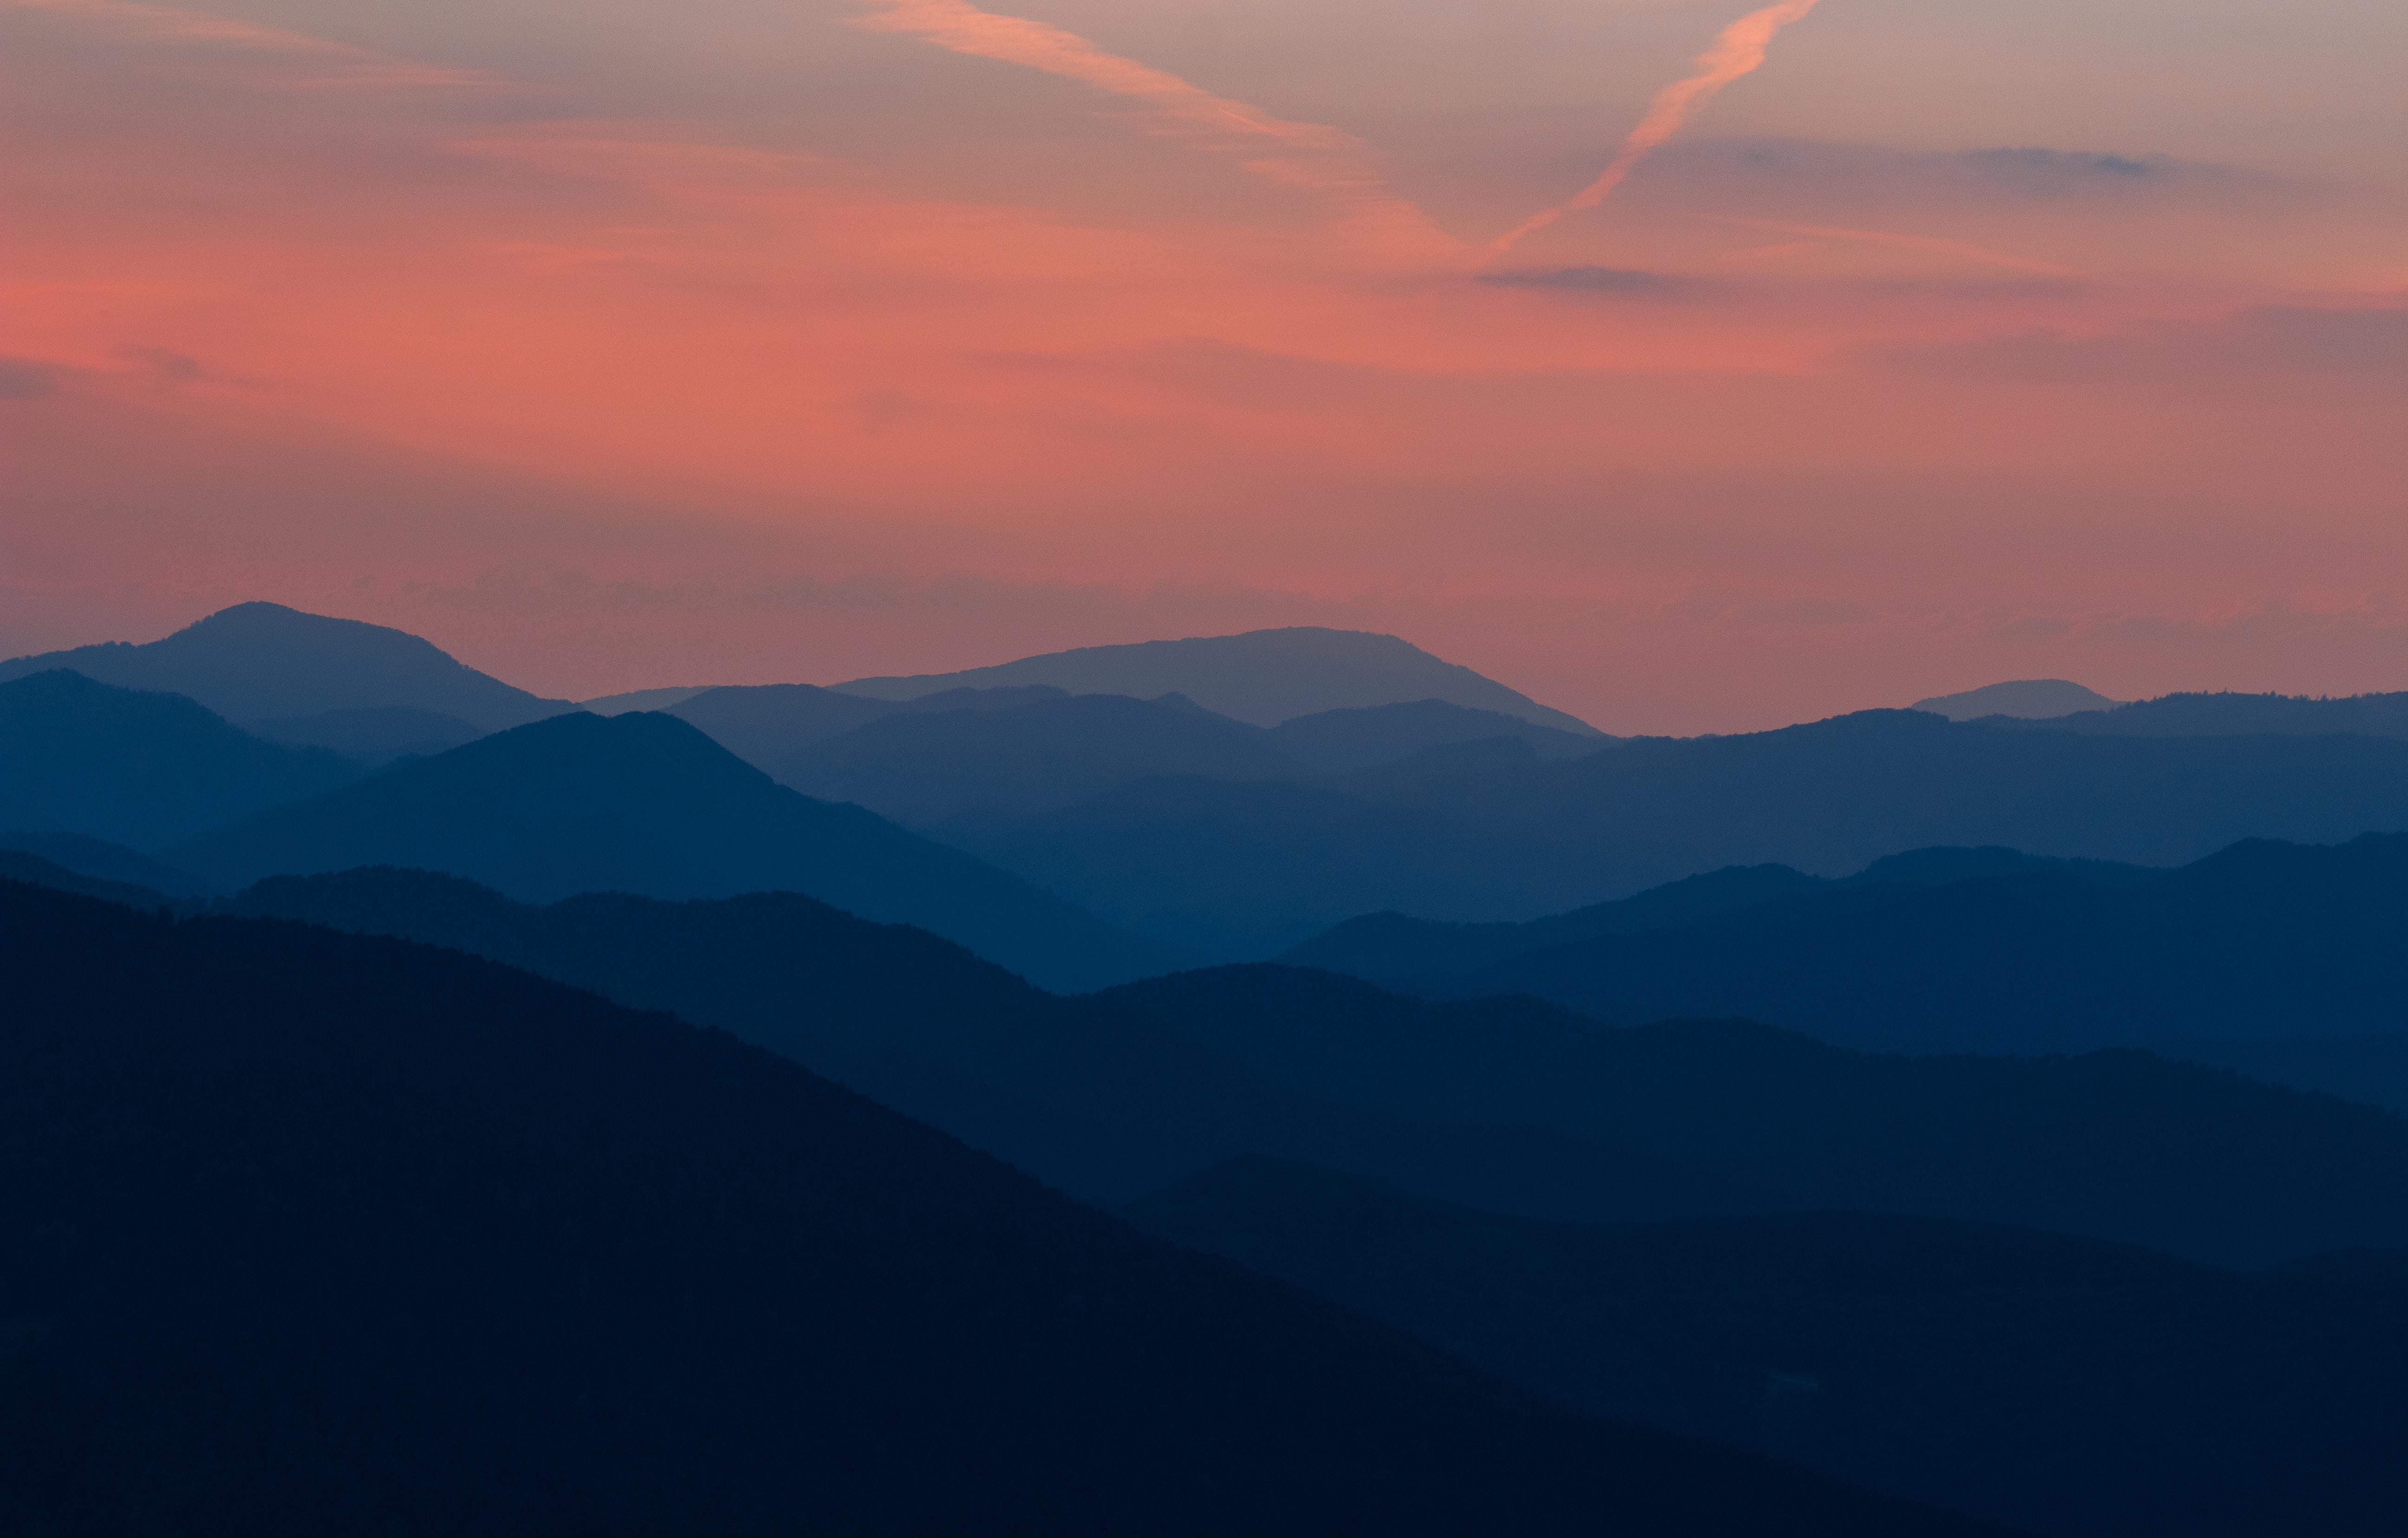 silhouette mountain wallpaper